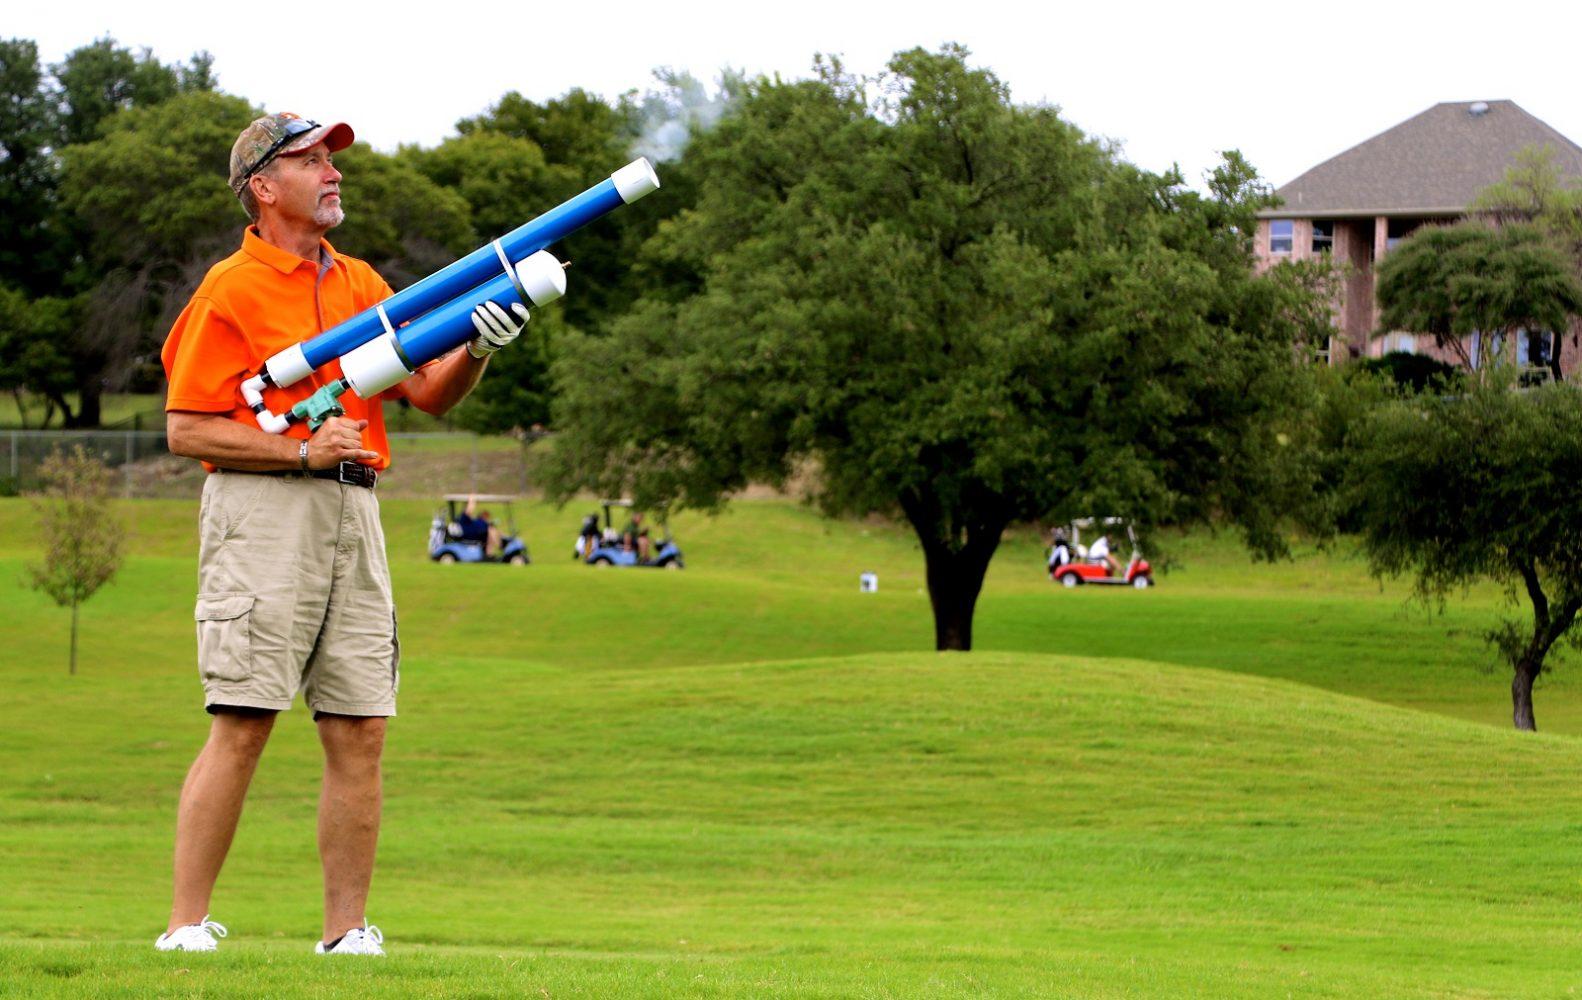 09_ST_GDA Golf Tourney